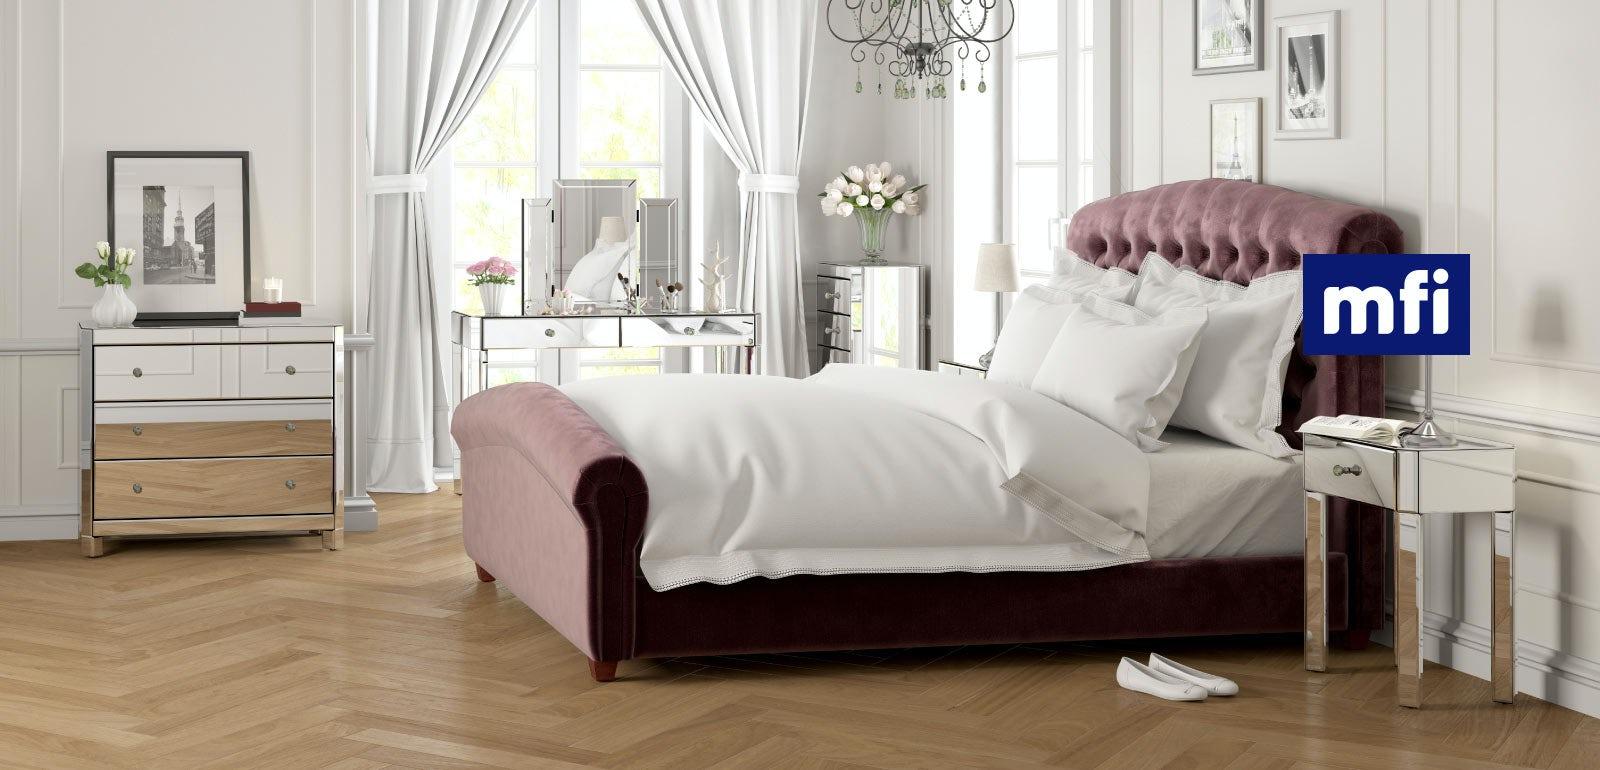 Mirrored glass bedroom furniture  VictoriaPlumcom